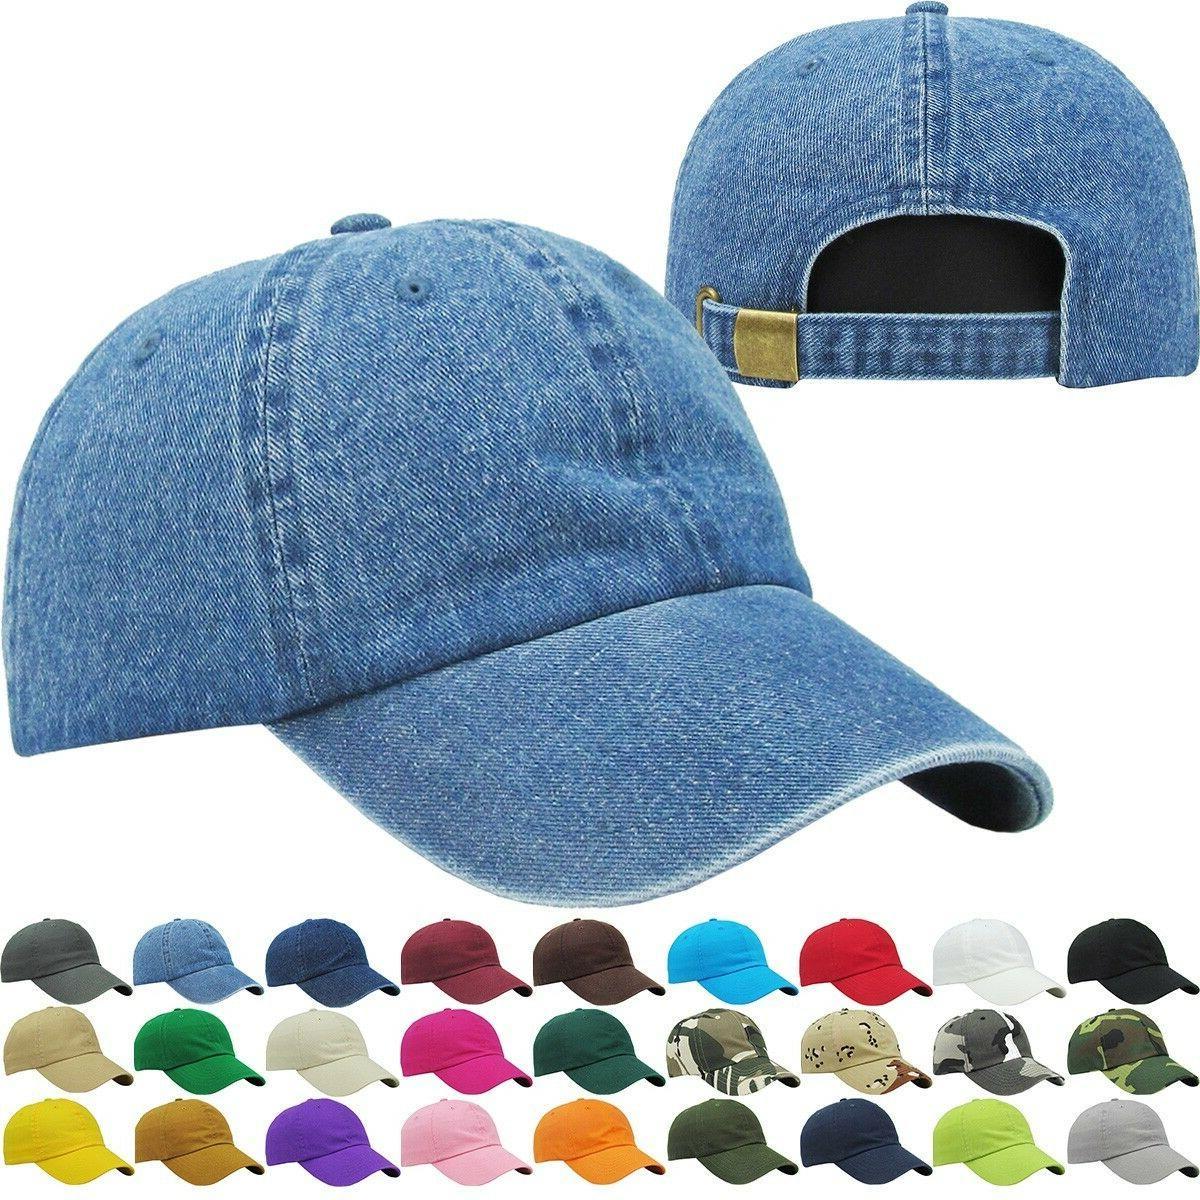 adjustable low crown solid baseball caps denim